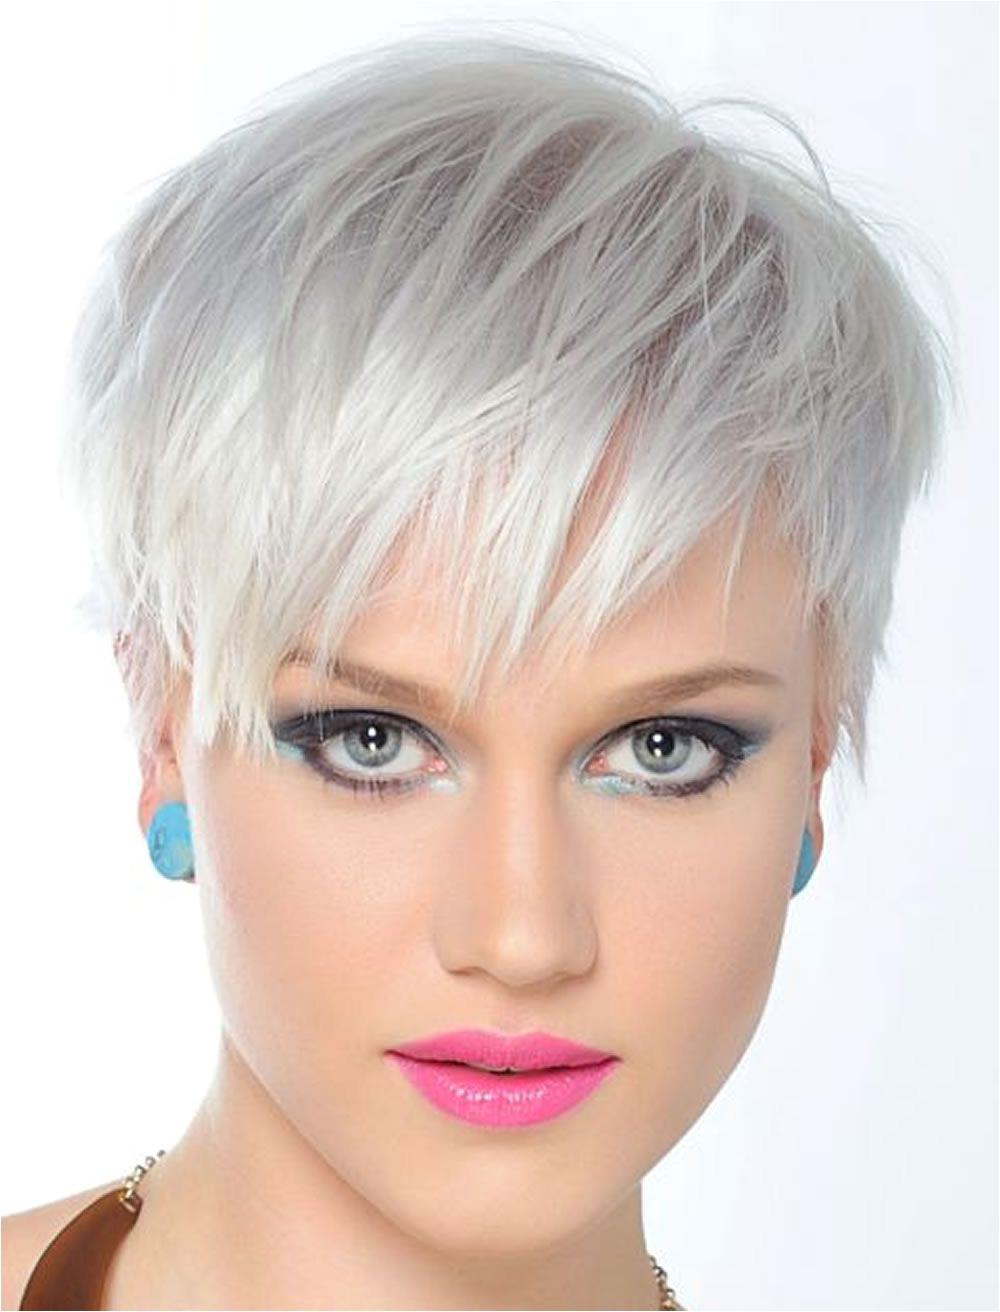 Easy Hairstyles for Short Hair 2018 & Pixie Hair Cuts Styles Art